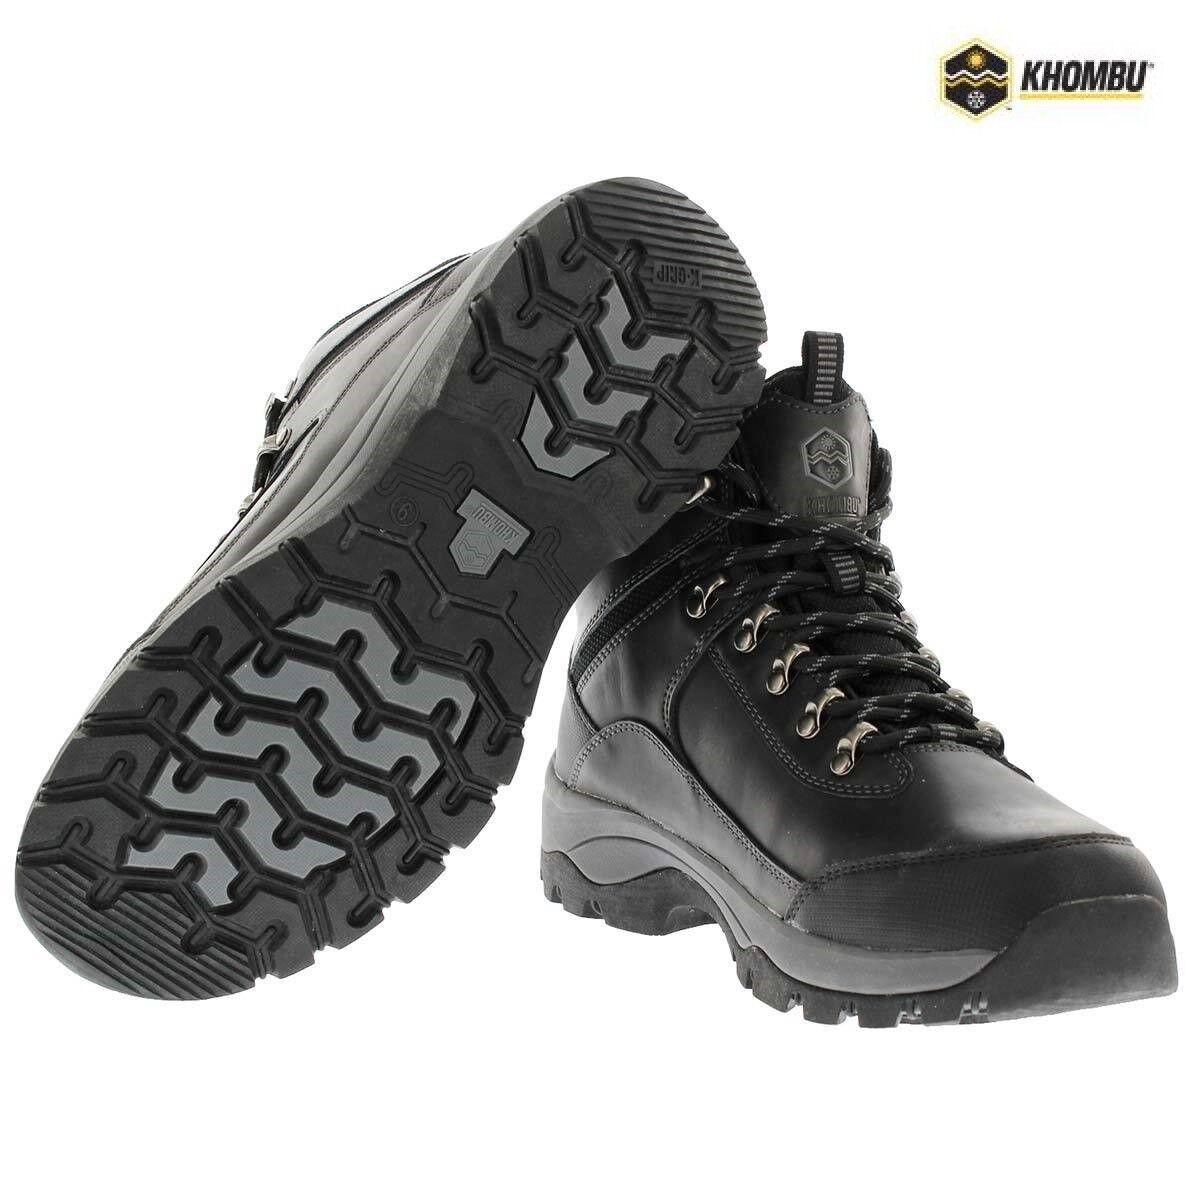 Mannens Khombu Summit Leer WaterBesteendig Hiking wandelen Trail Mid laarzen schoenen afmeting